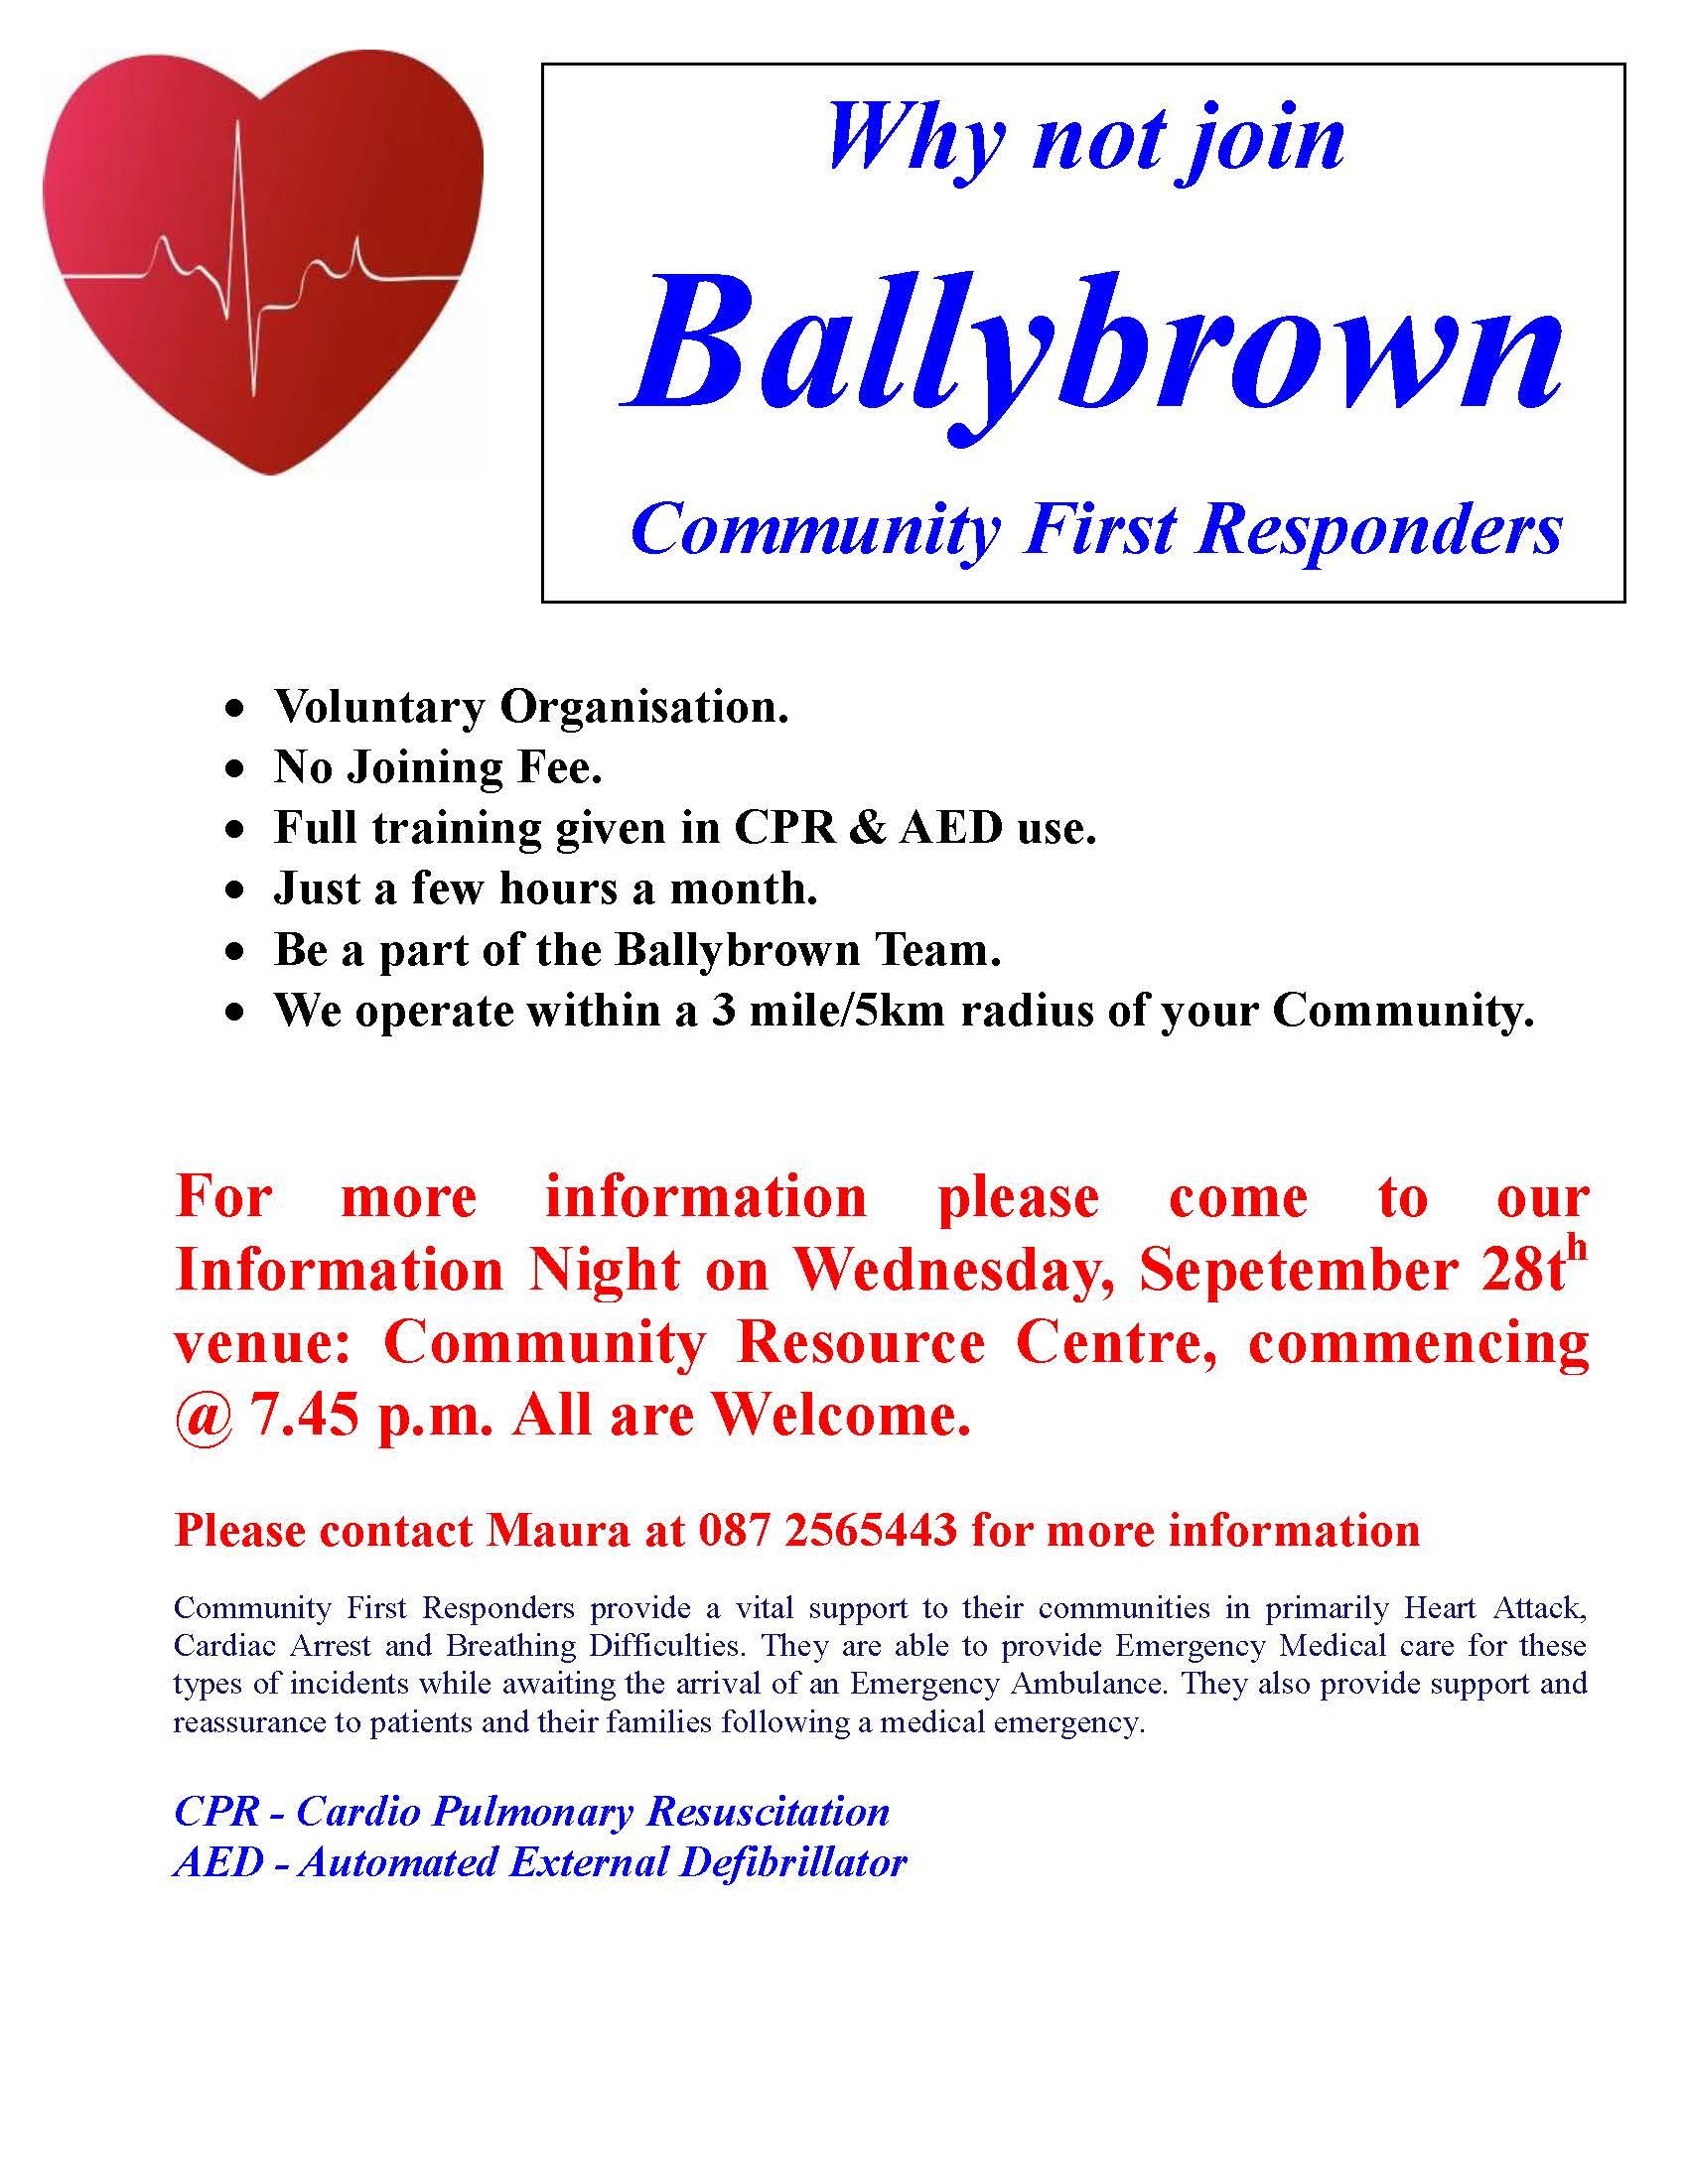 information-night-poster